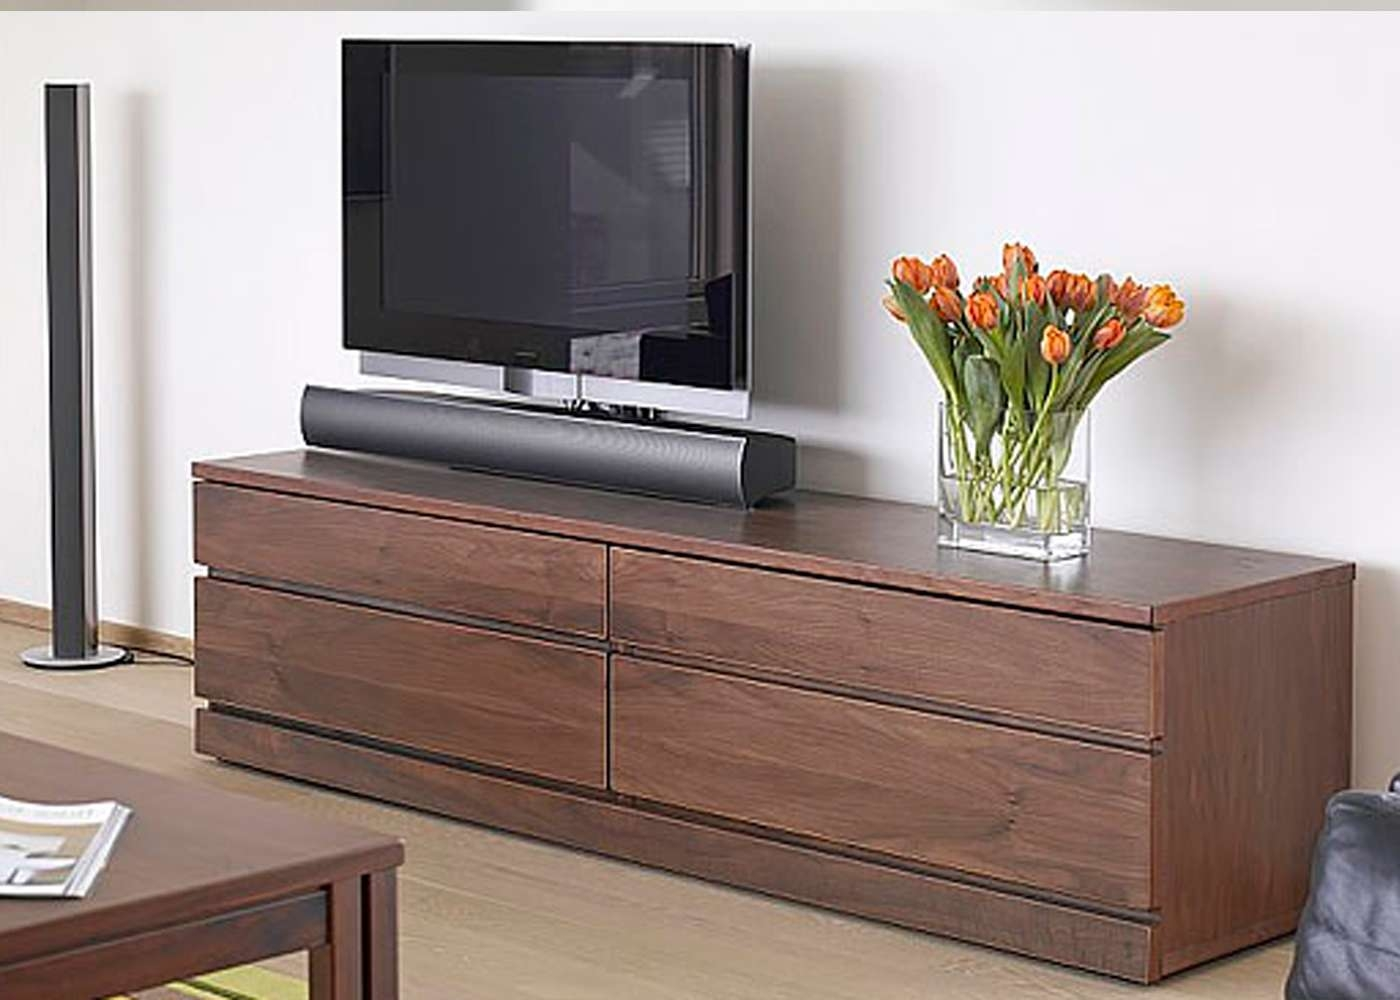 Skovby Sm87 Tv Cabinet In Walnut Finish 1 – Midfurn Furniture Inside Walnut Tv Cabinets (View 5 of 20)